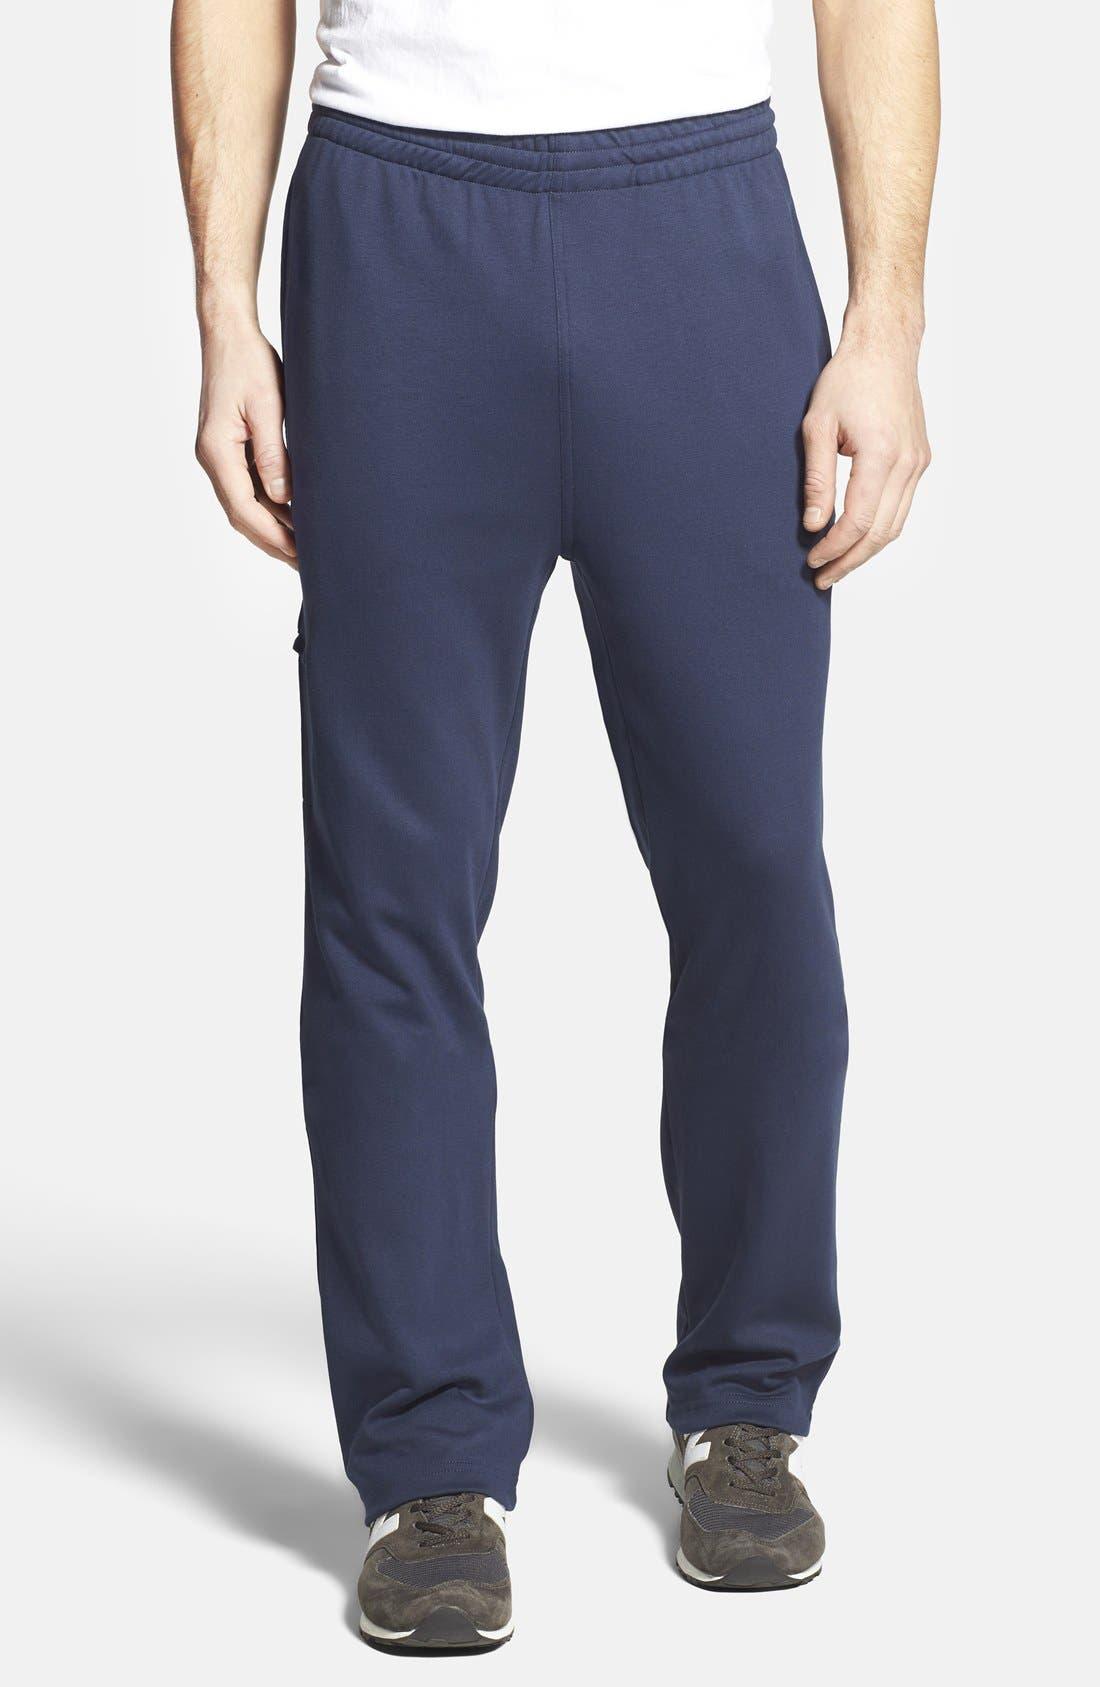 Men's Bobby Jones 'Leaderboard' Sweatpants